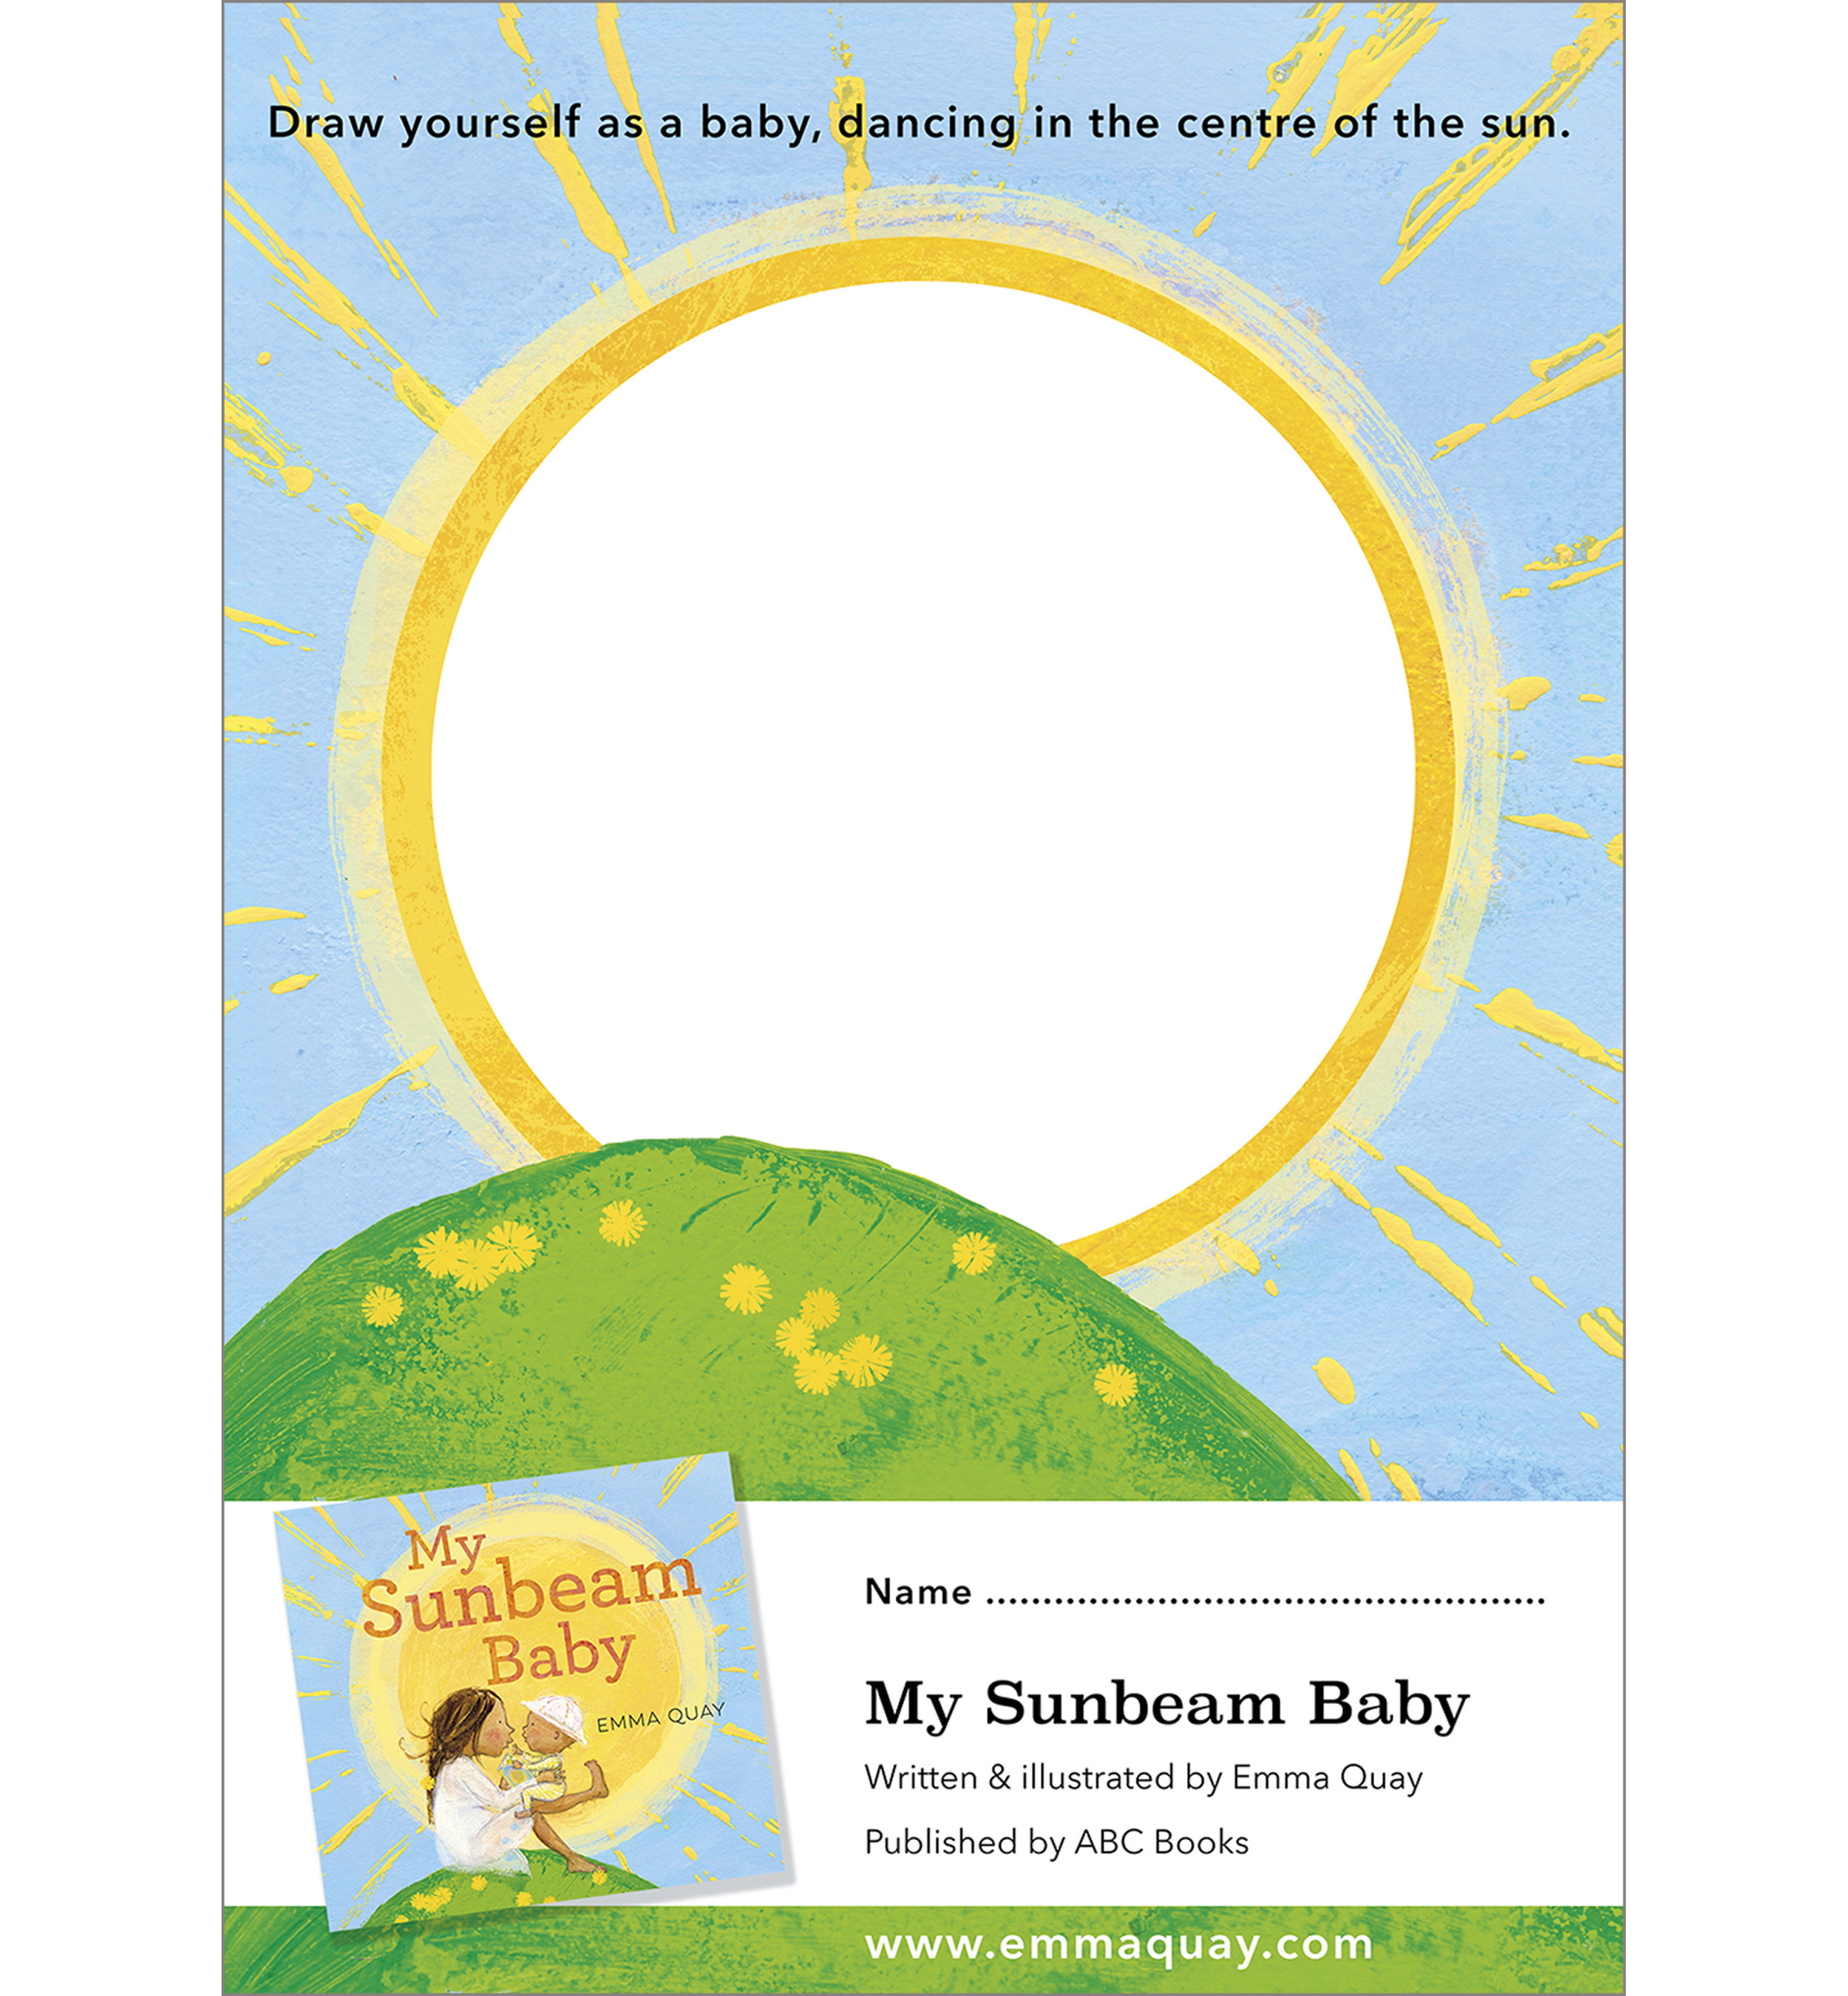 MY SUNBEAM BABY drawing activity • http://www.emmaquay.com